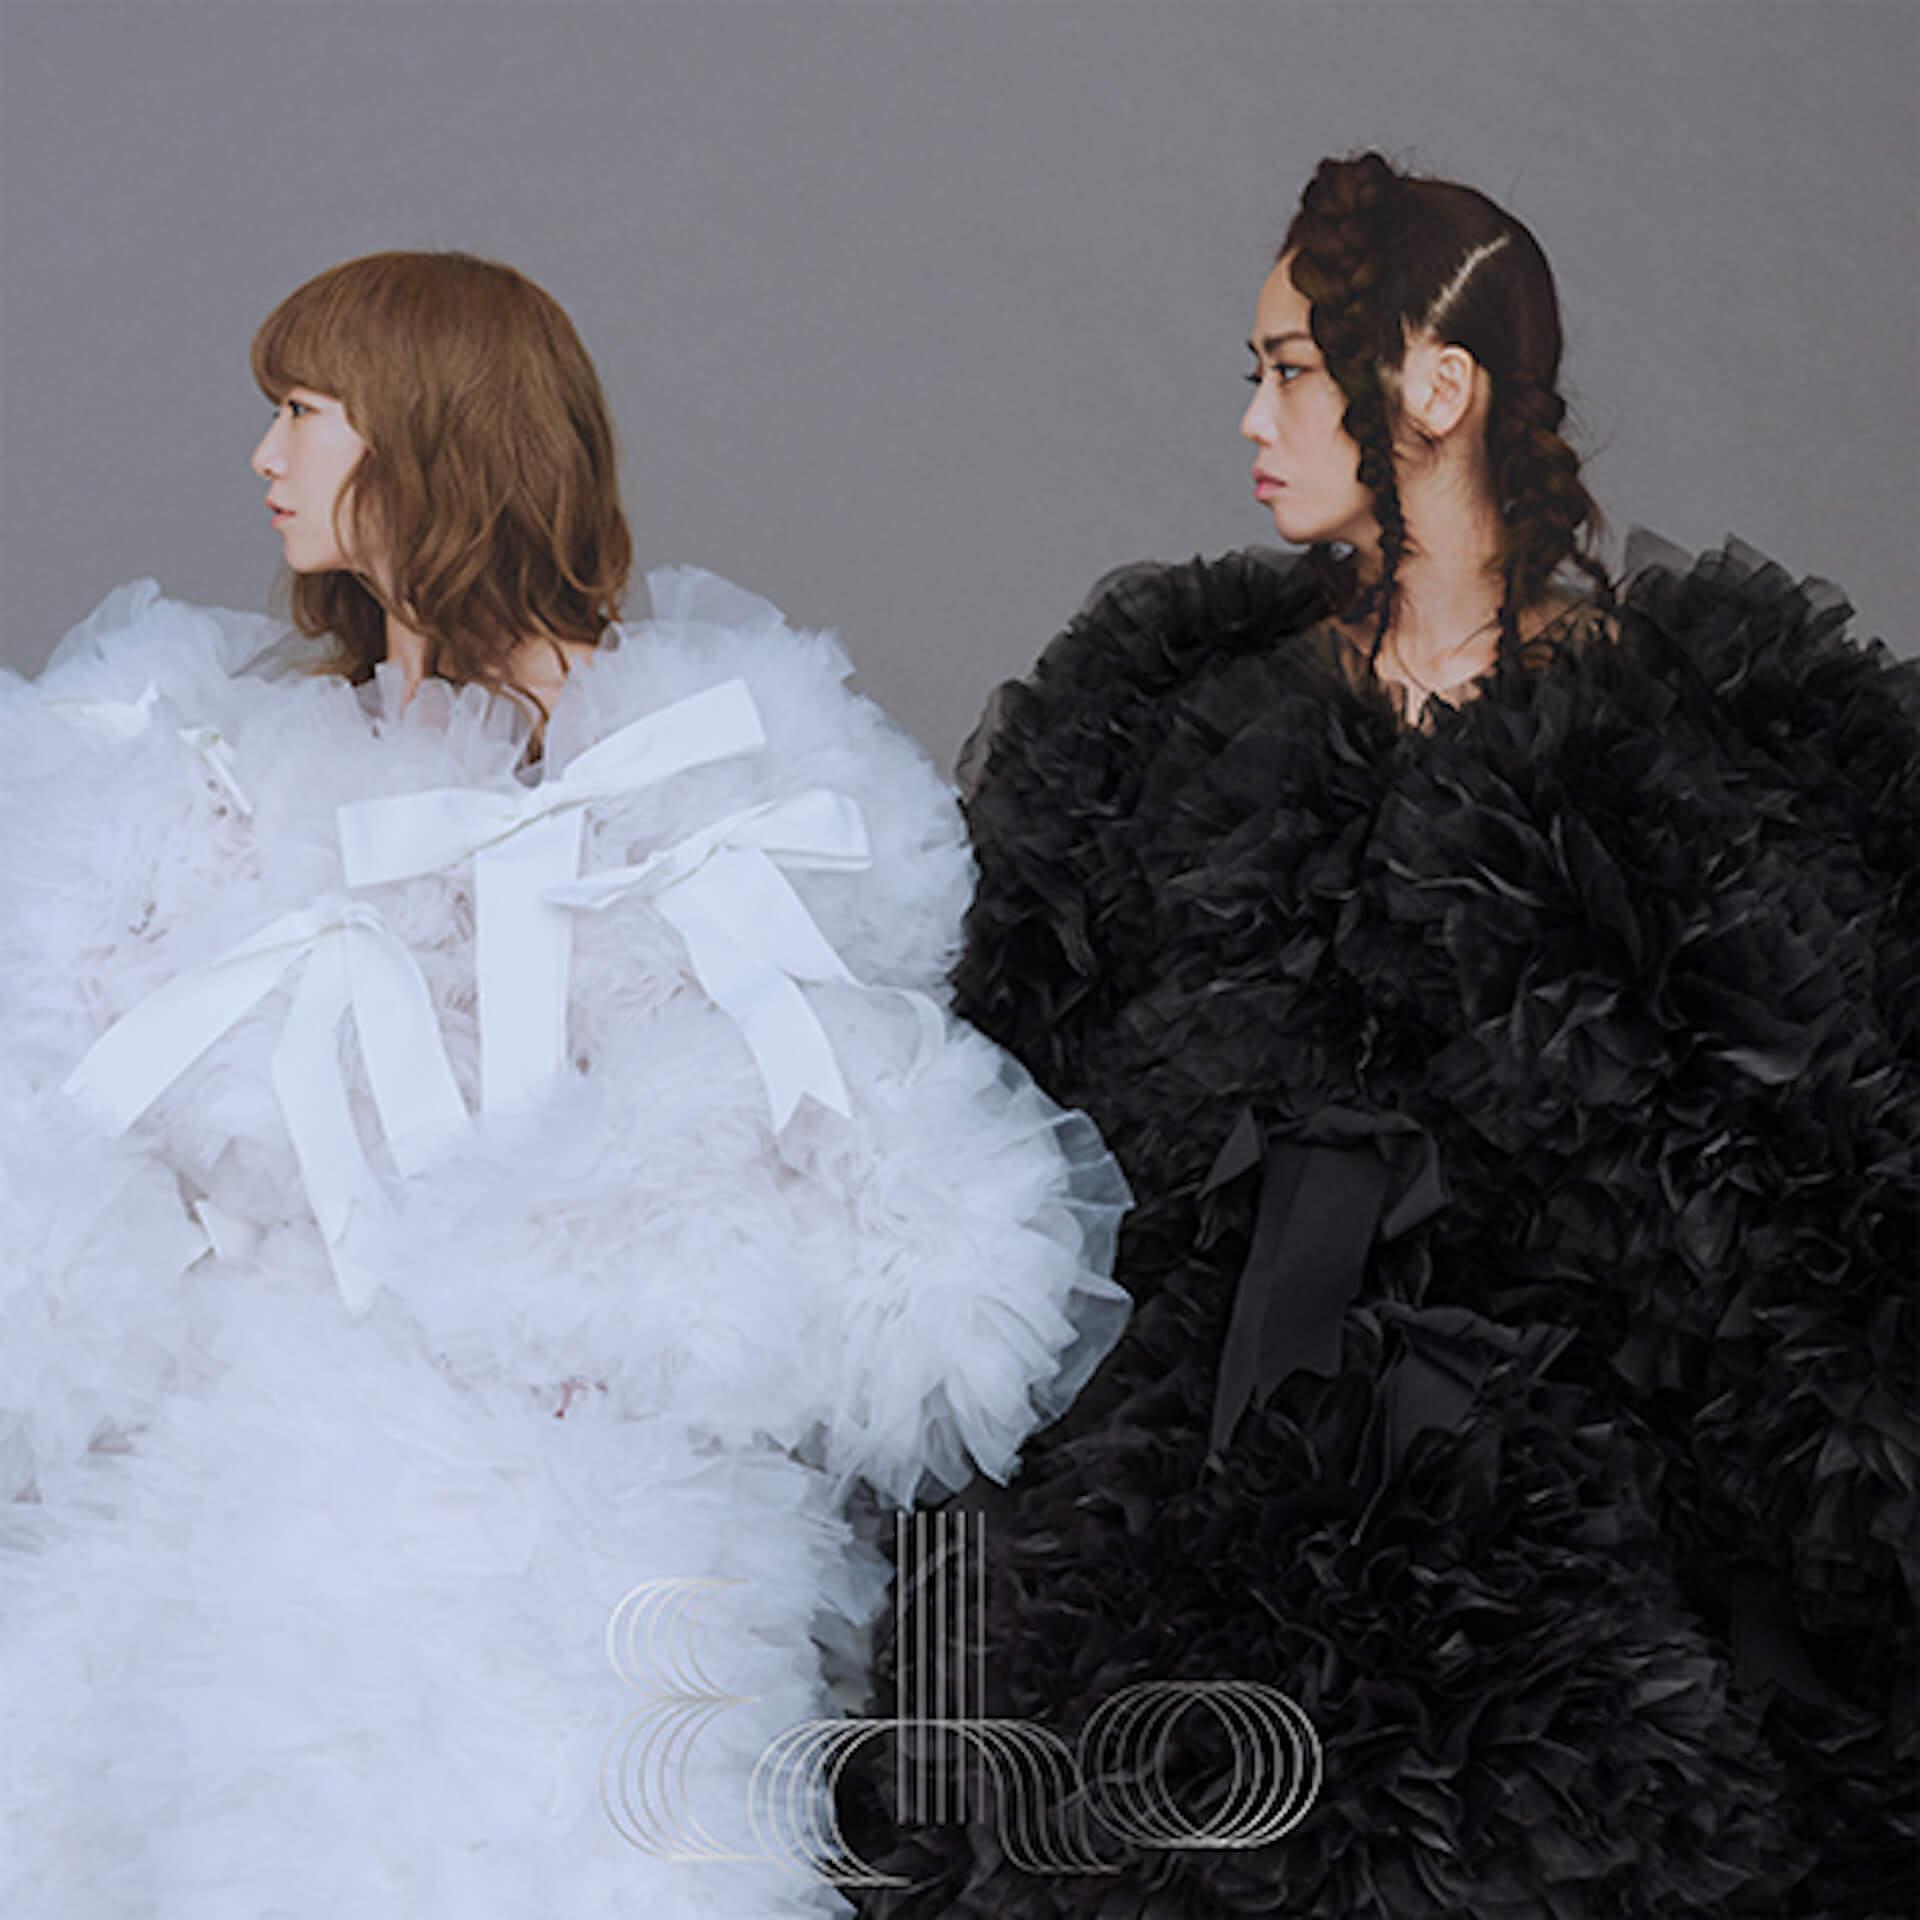 Chara+YUKI、本日リリースのシングル「楽しい蹴伸び」のMVを公開 MV共演は21年ぶり music200131_charayuki_1